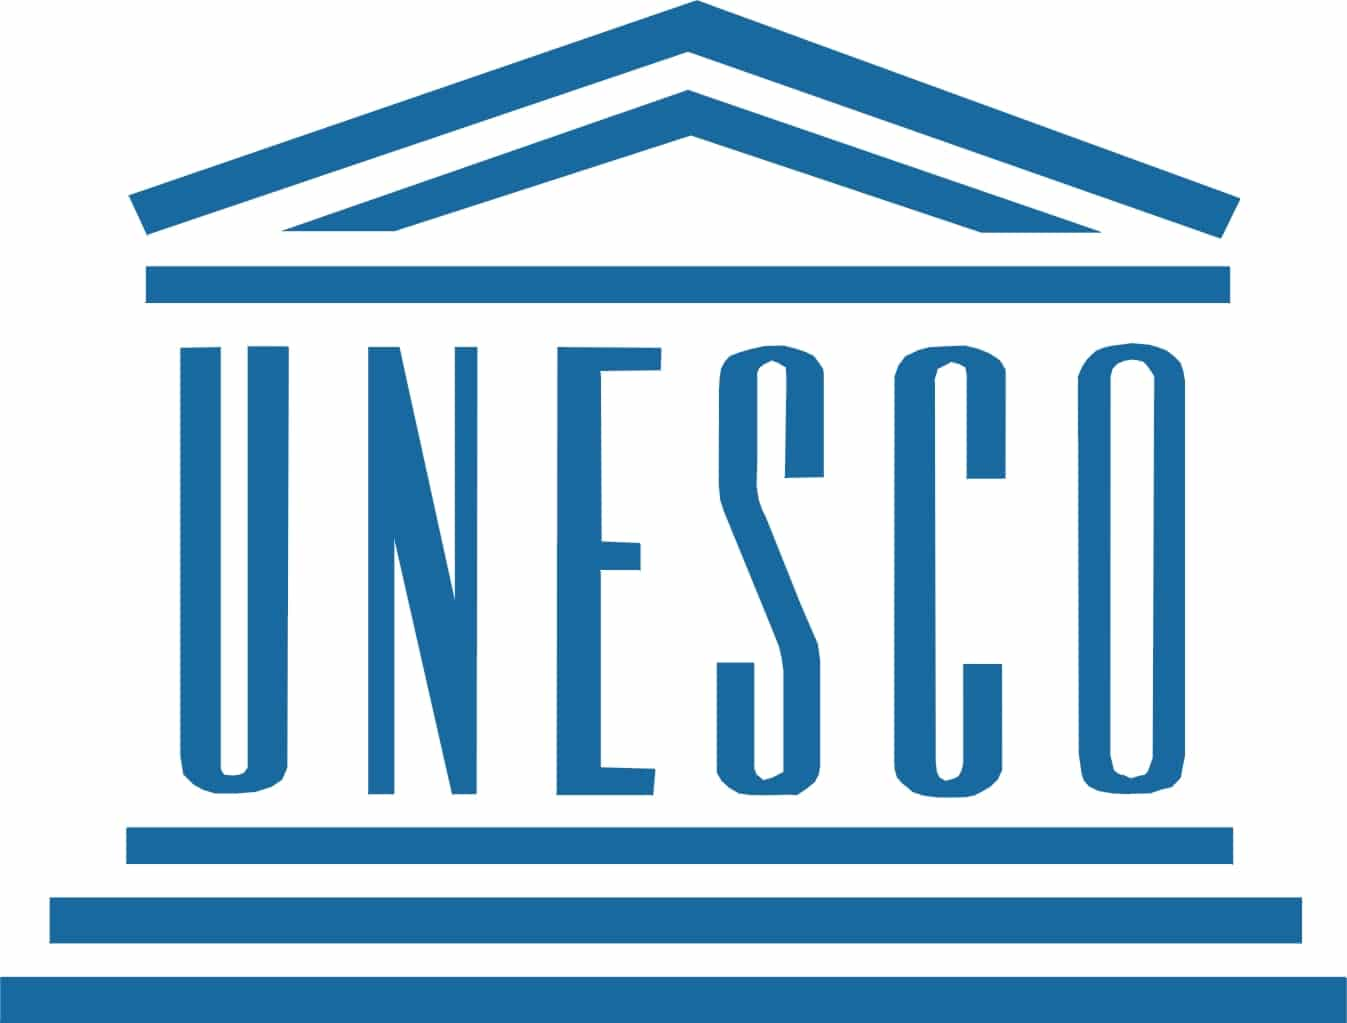 Programme de bourses UNESCO ISEDC